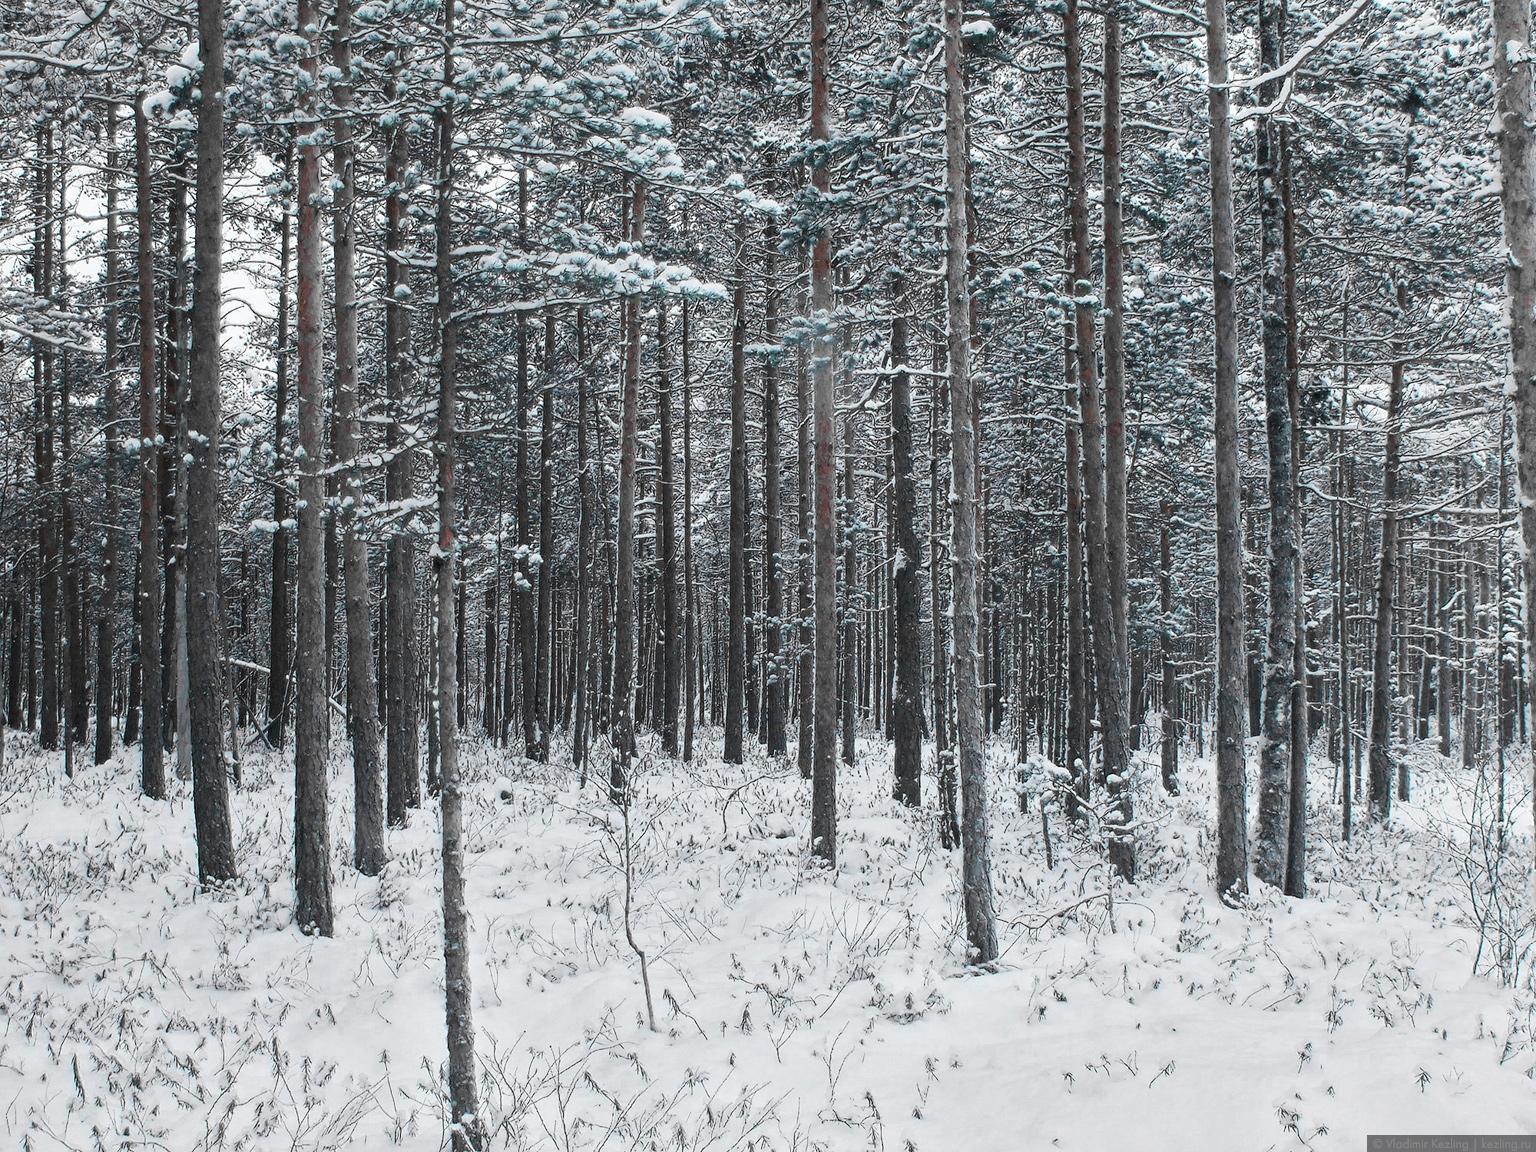 Национальный парк Валкмуса